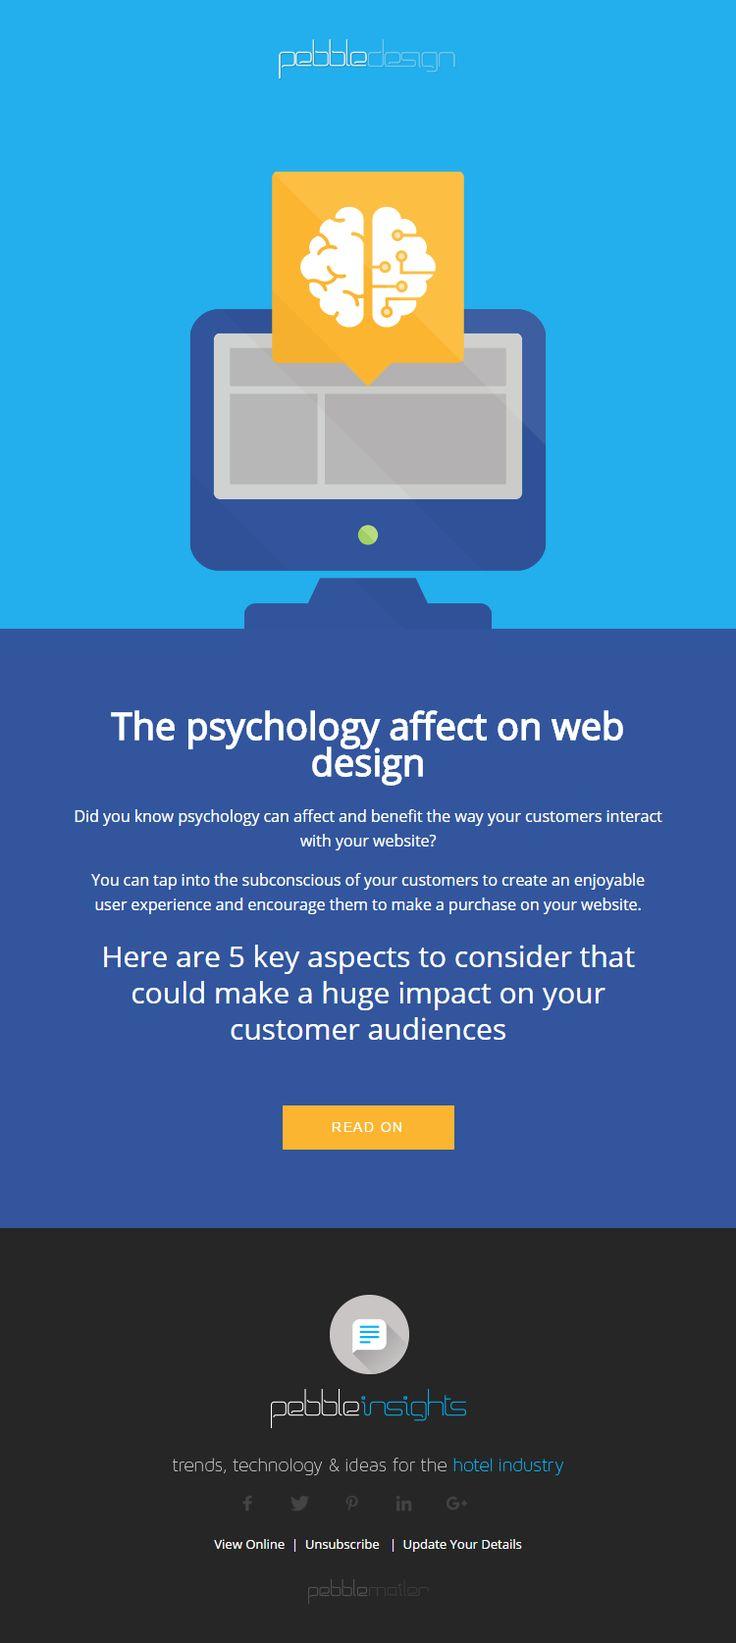 The psychology affect on web design - Hospitality Insights #hospitalityinsights #hotelwebdesign #hotelwebsitedesign #pebbledesign #hotelwebsites